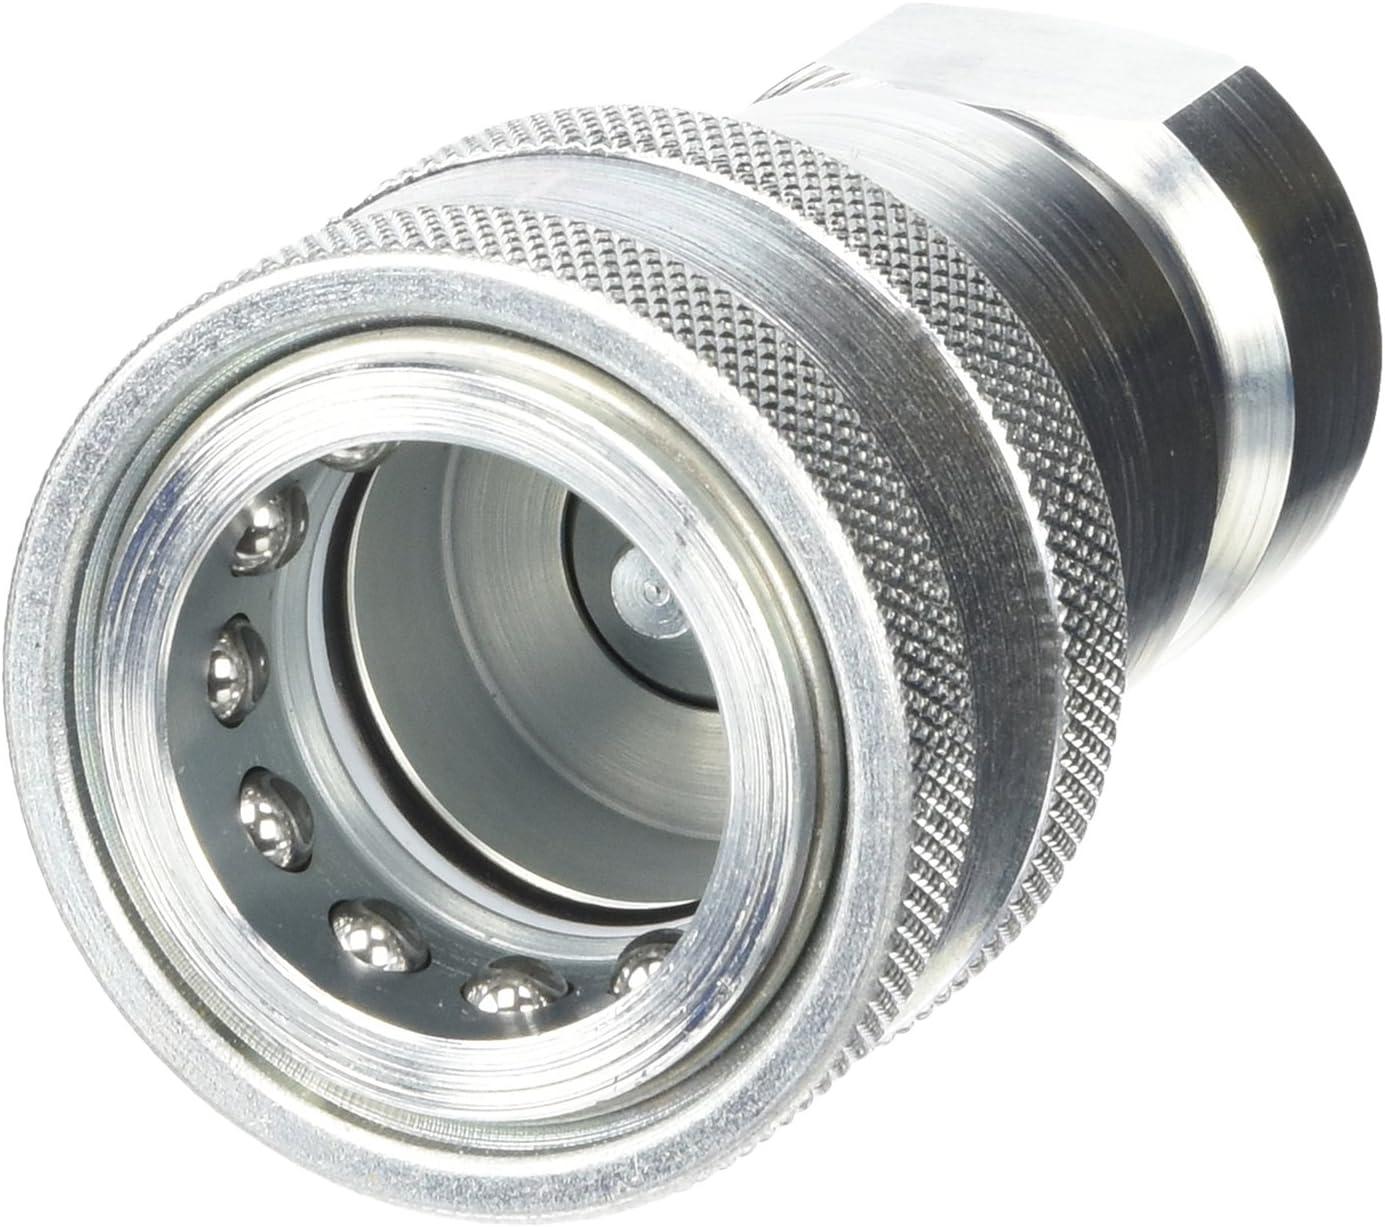 Gates Hydraulic Hose Quick Disconnect Coupler G94521-1212 NOS